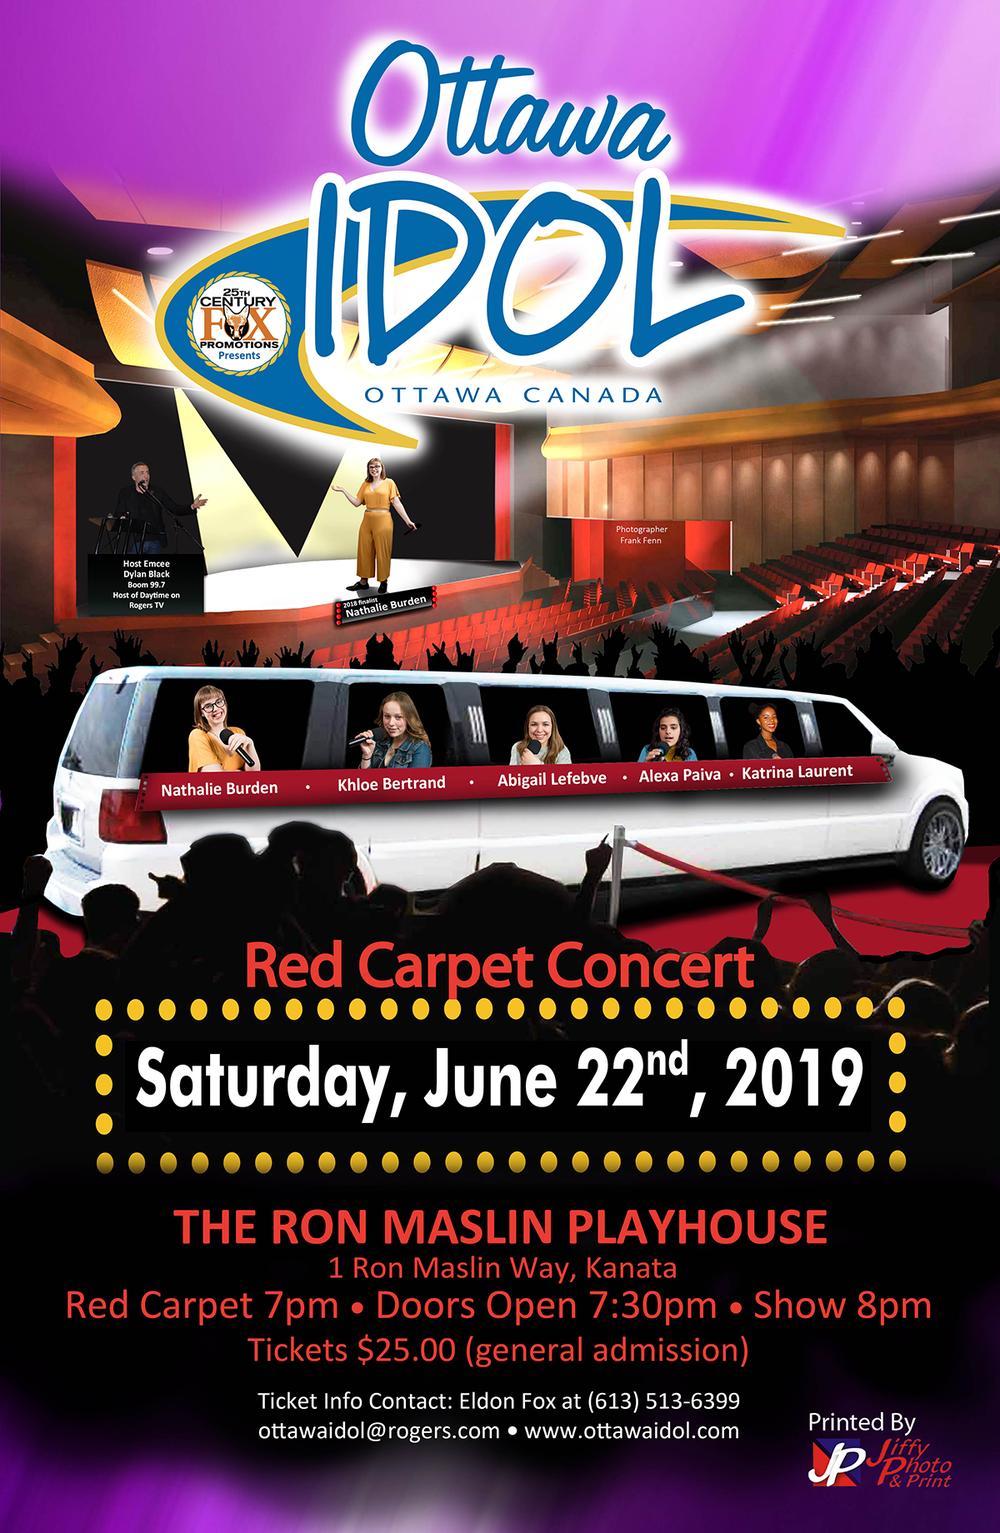 Ottawa-Idol-2019_Red-Carpet-Concert-poster_02[1378].png